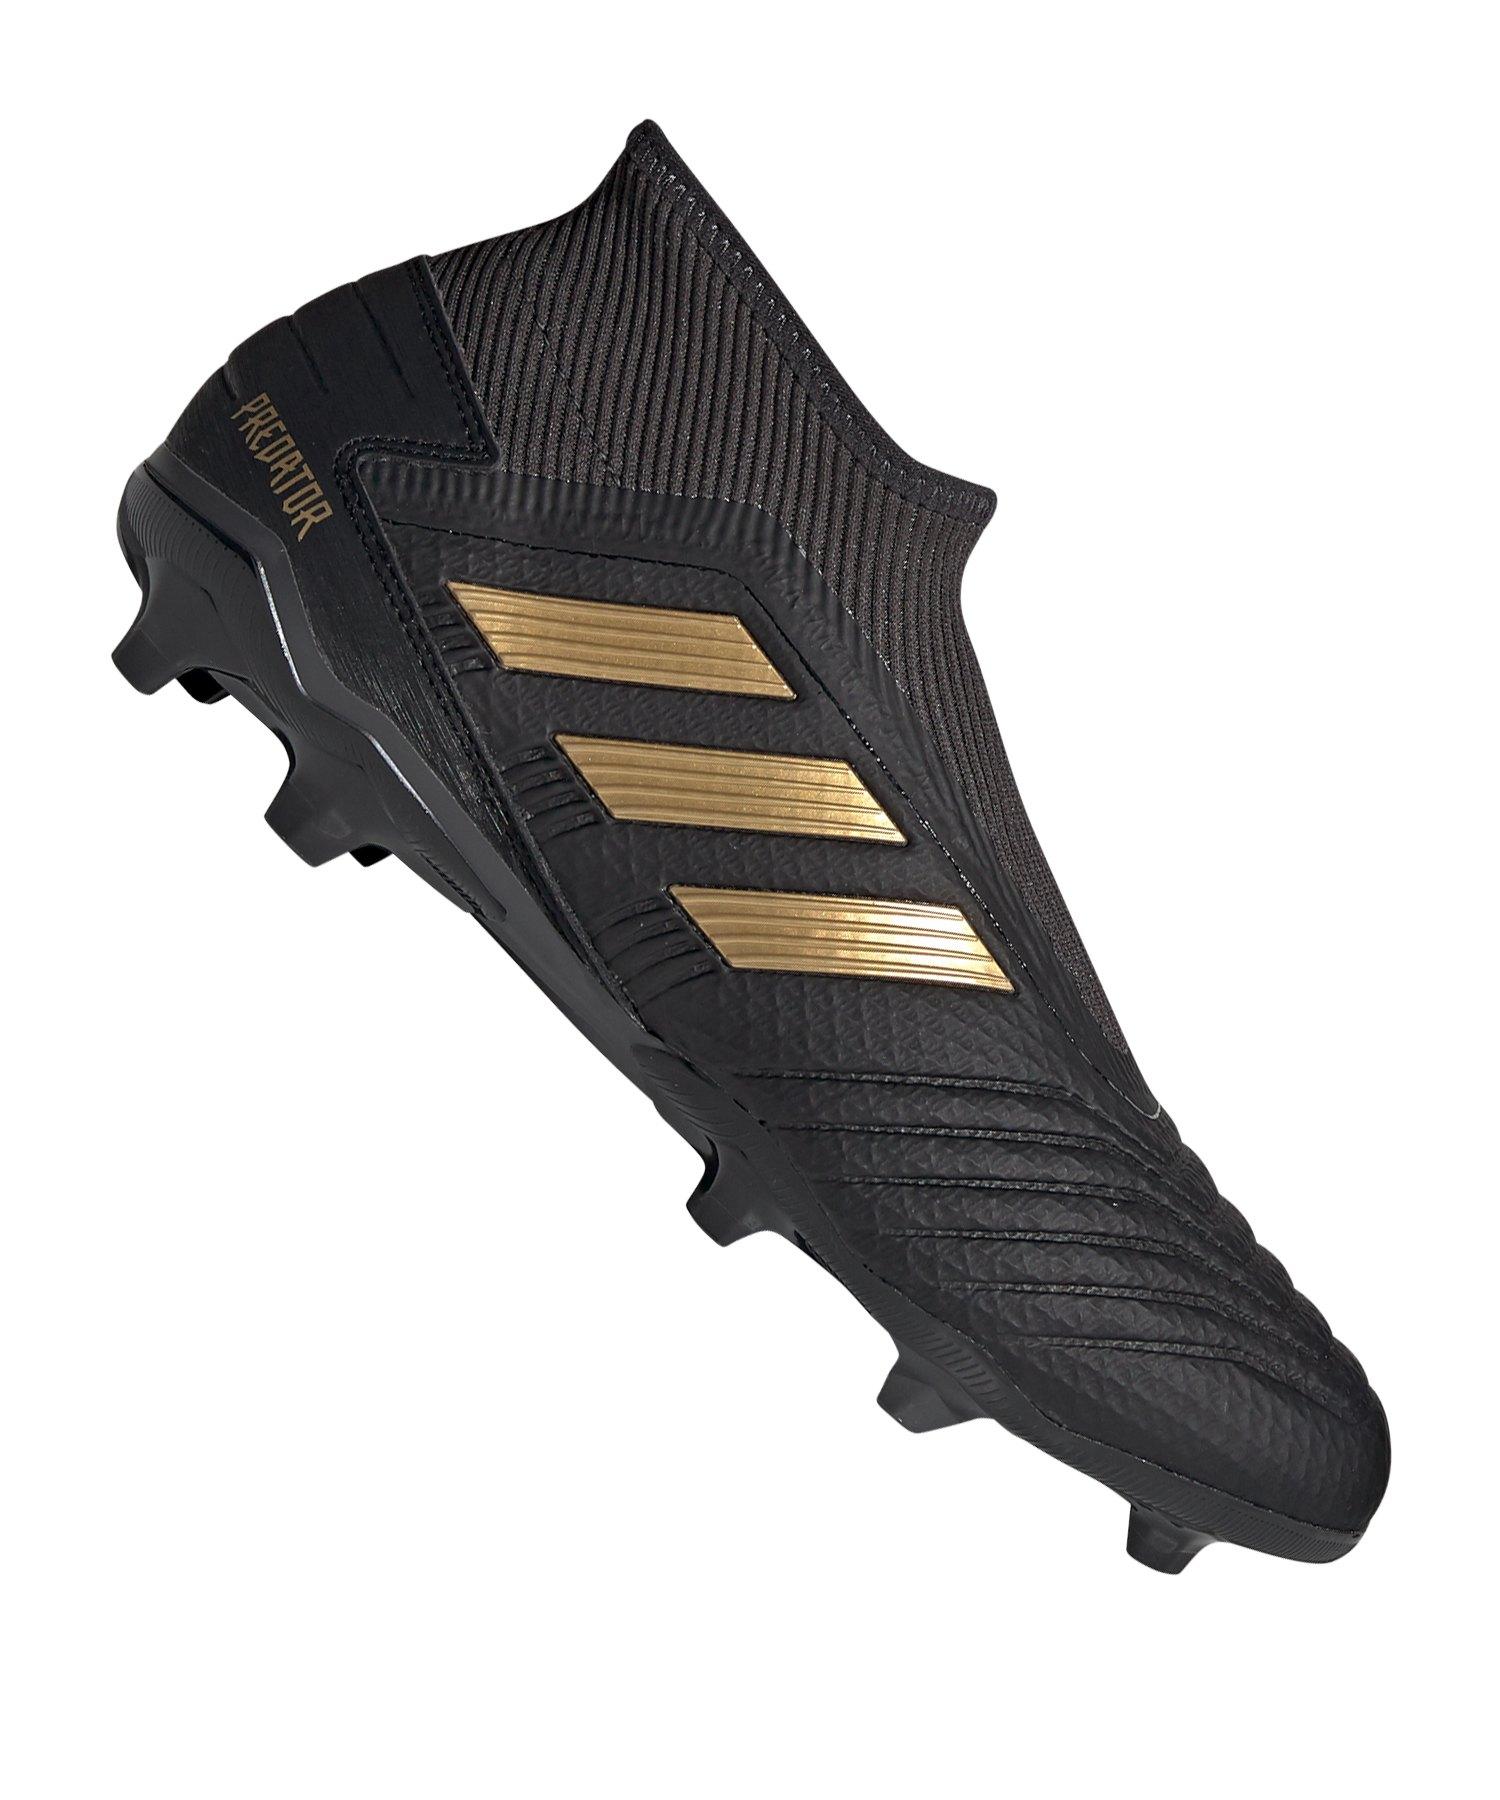 adidas Predator 19.3 LL FG Schwarz Gold - Schwarz